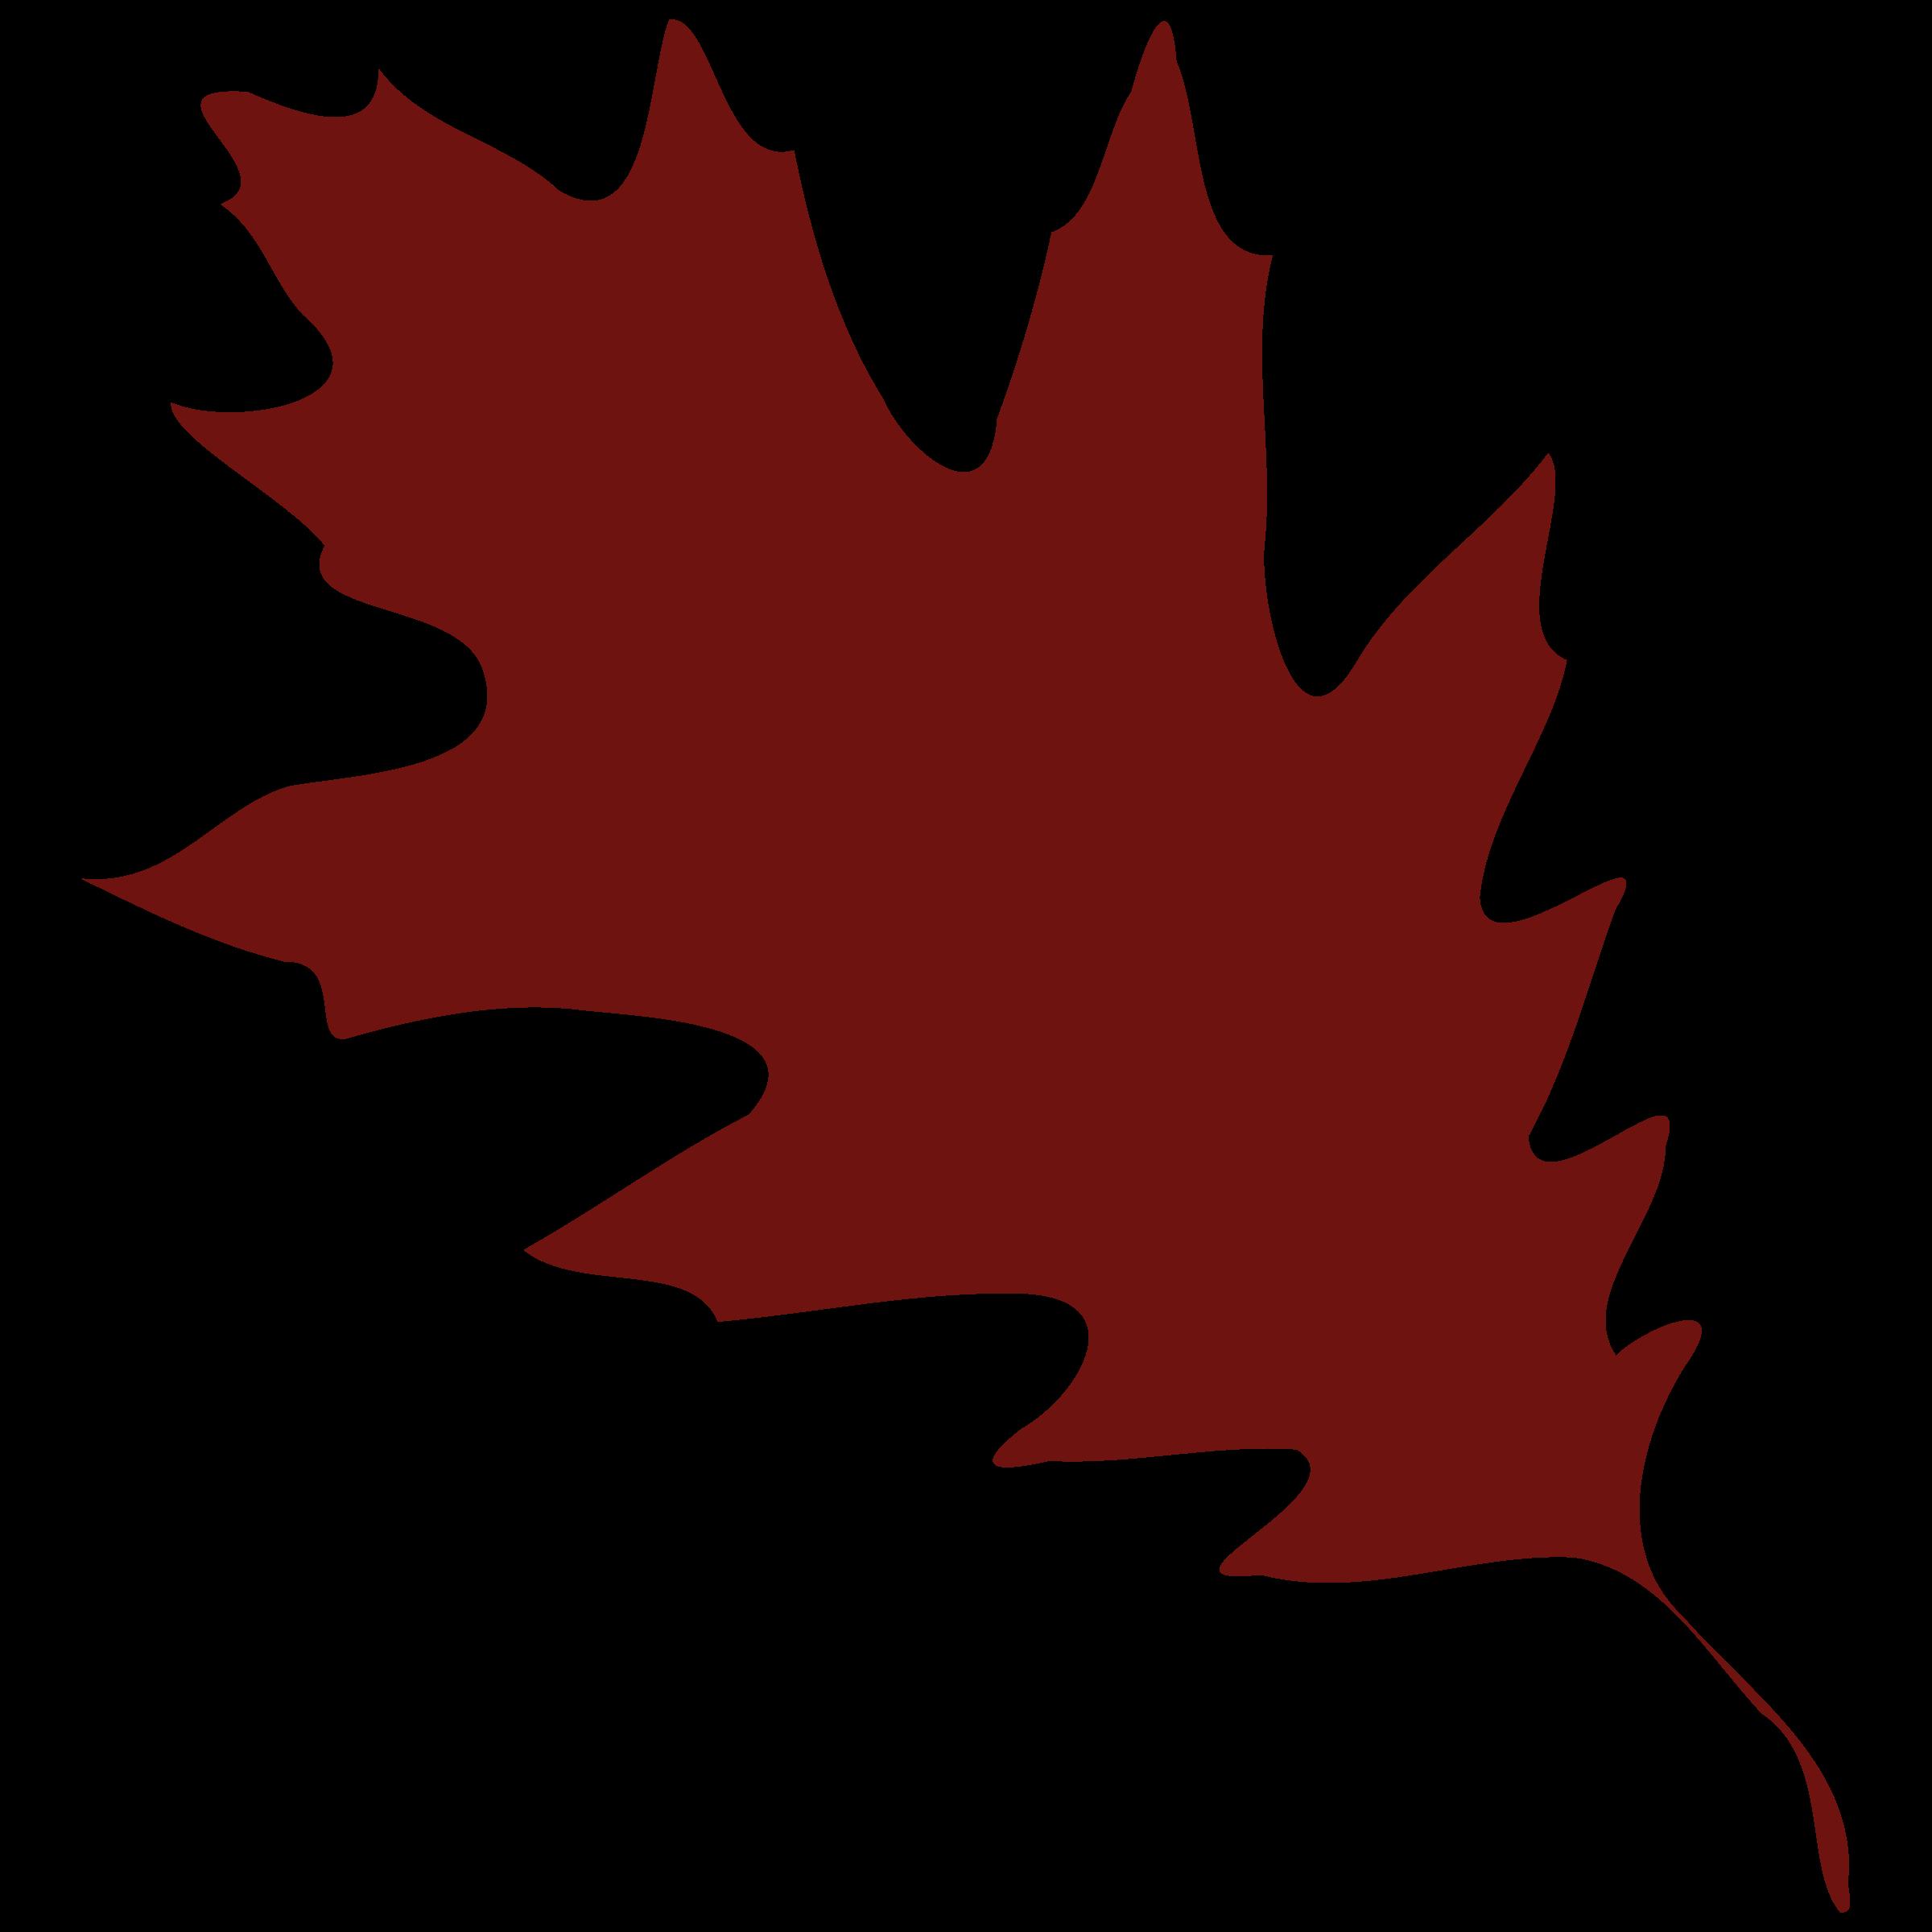 Silhouette Of A Leaf.